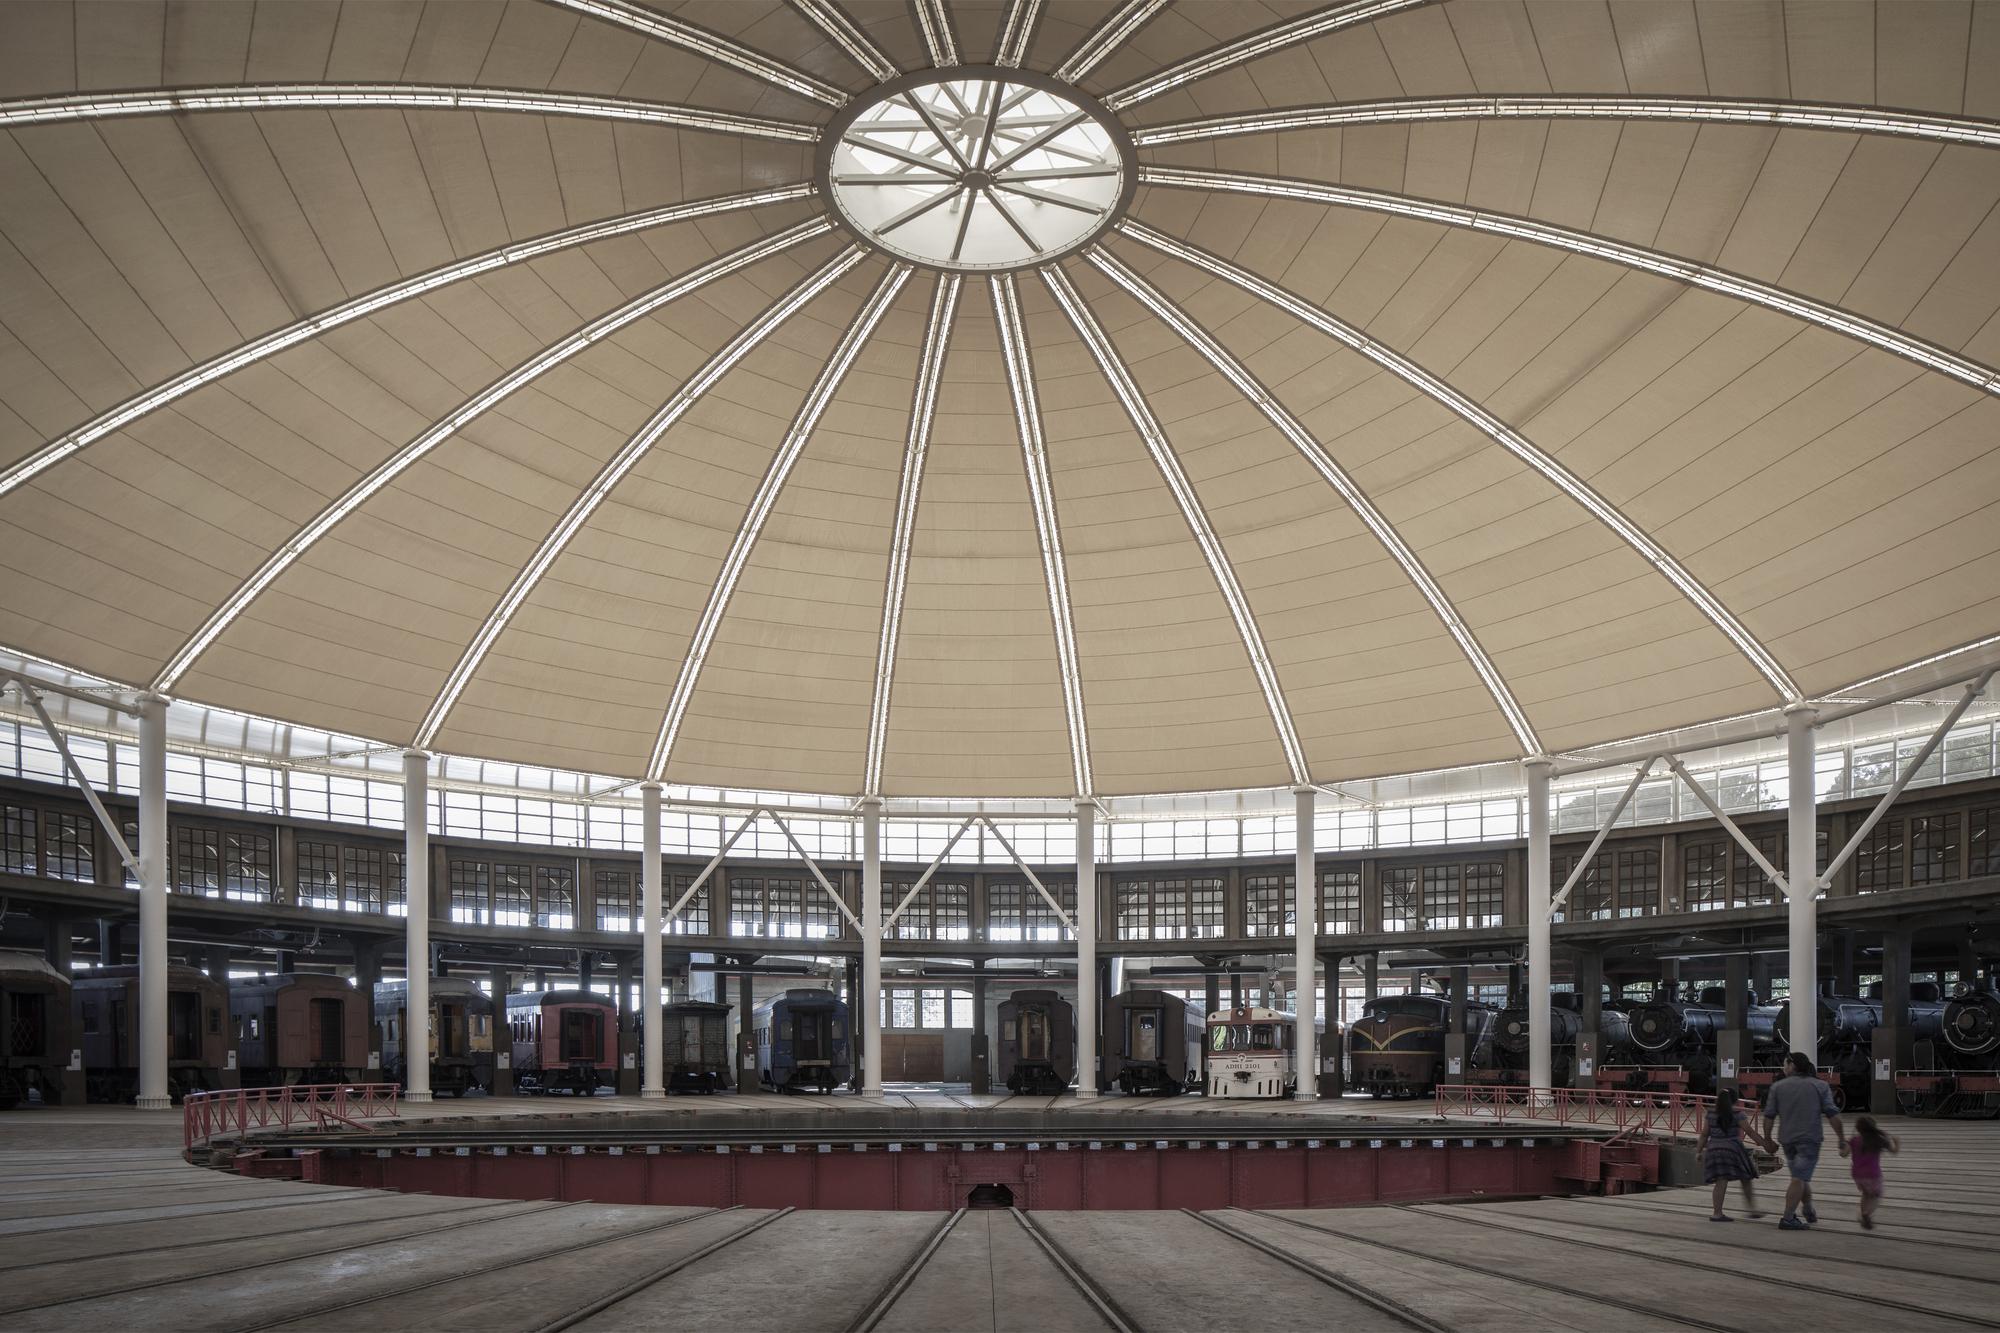 Railway Museum Pablo Neruda / Chauriye Stäger Arquitectos